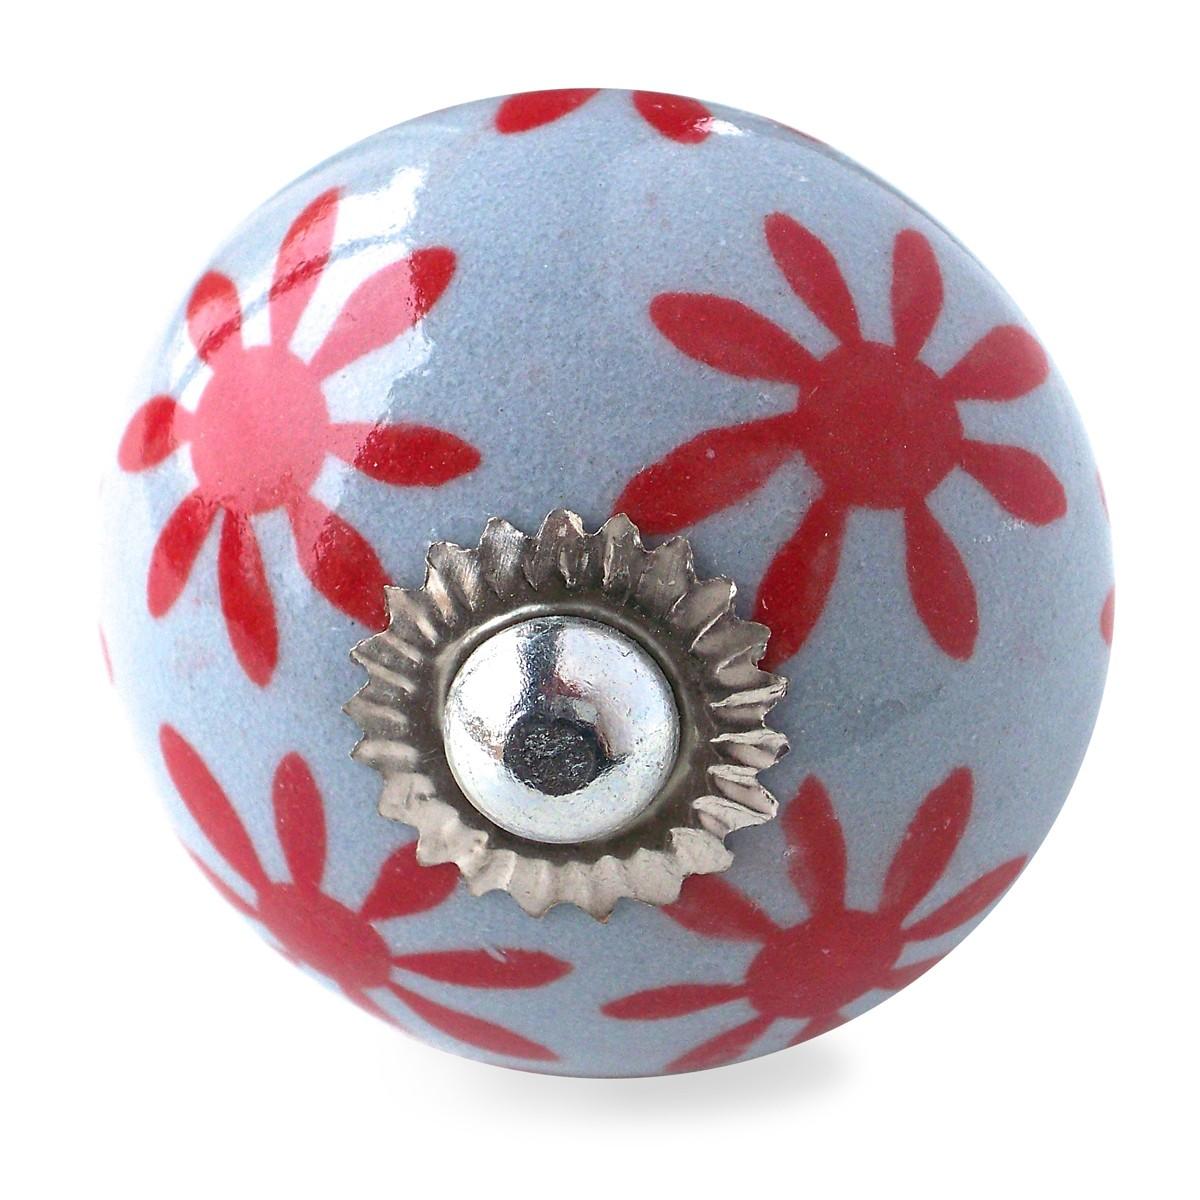 bouton de meuble marguerite gris et rouge vintage 2 90 gr3. Black Bedroom Furniture Sets. Home Design Ideas